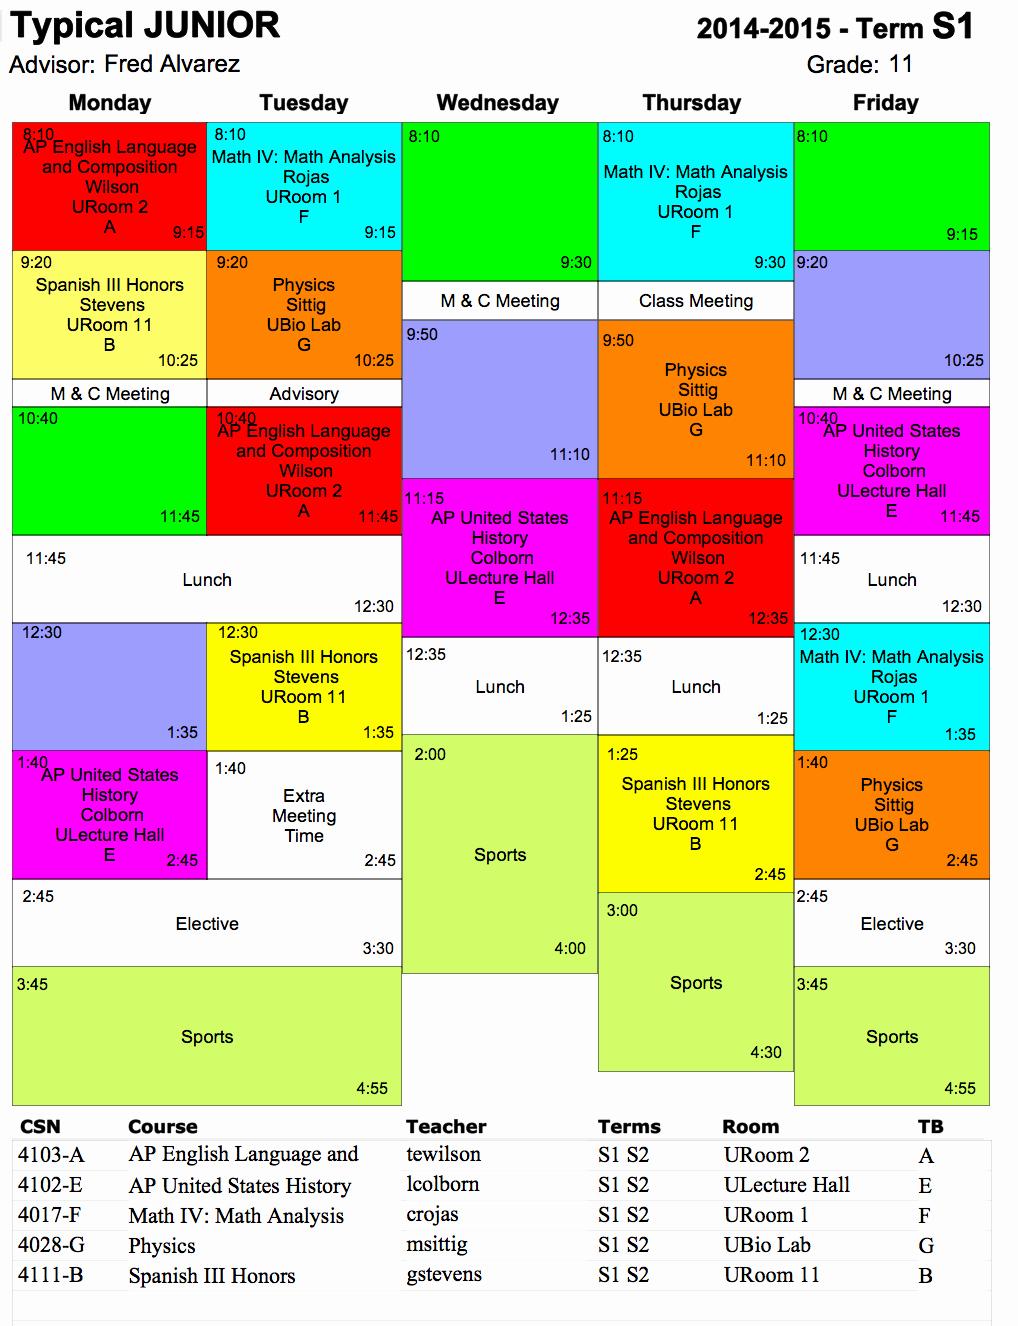 High School Class Schedule Sample Beautiful Typical Schedule Hs Ojai Valley School Private